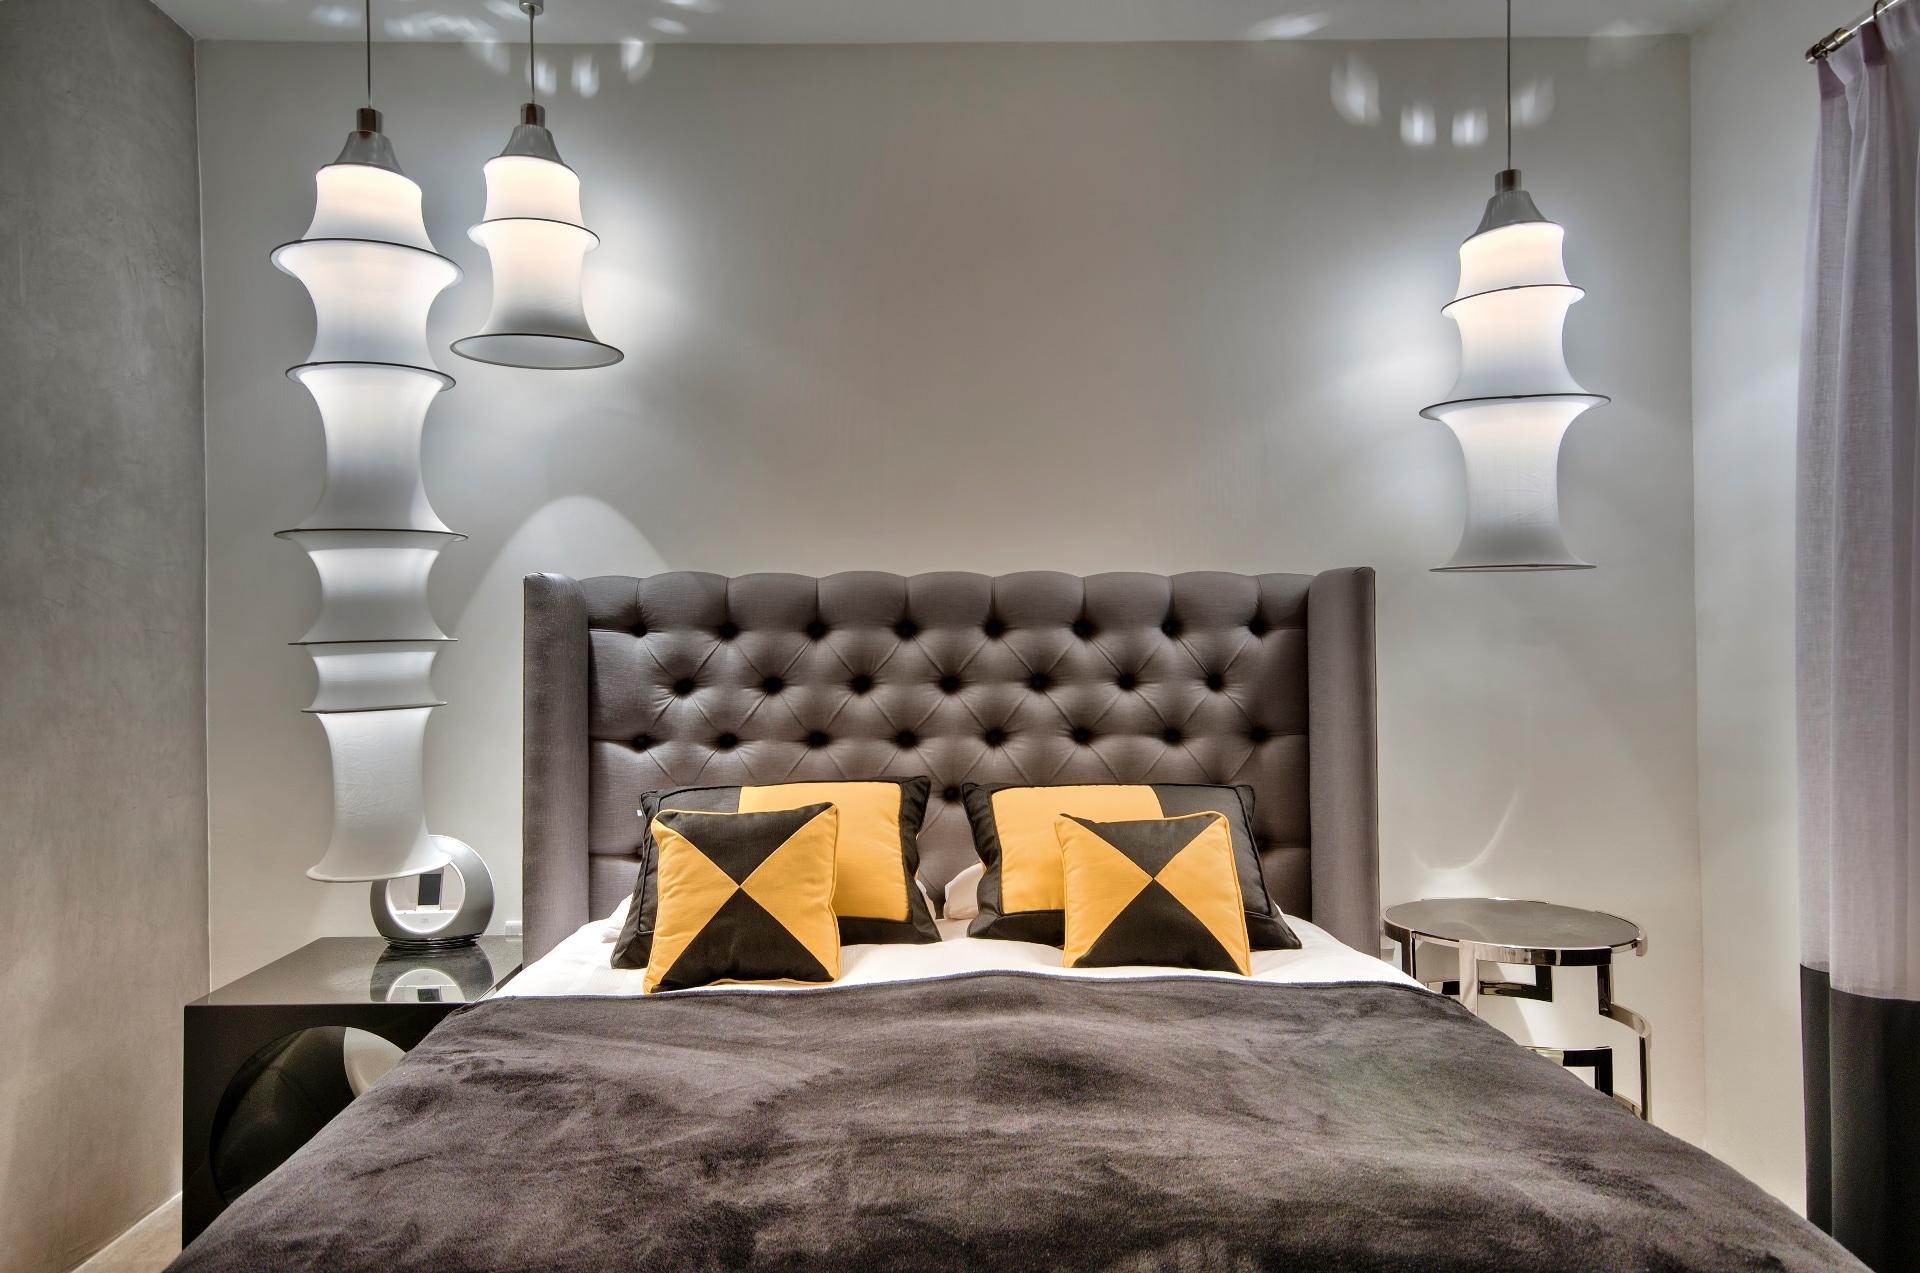 Main Bedroom- feature lights, throws, pillows, headboard